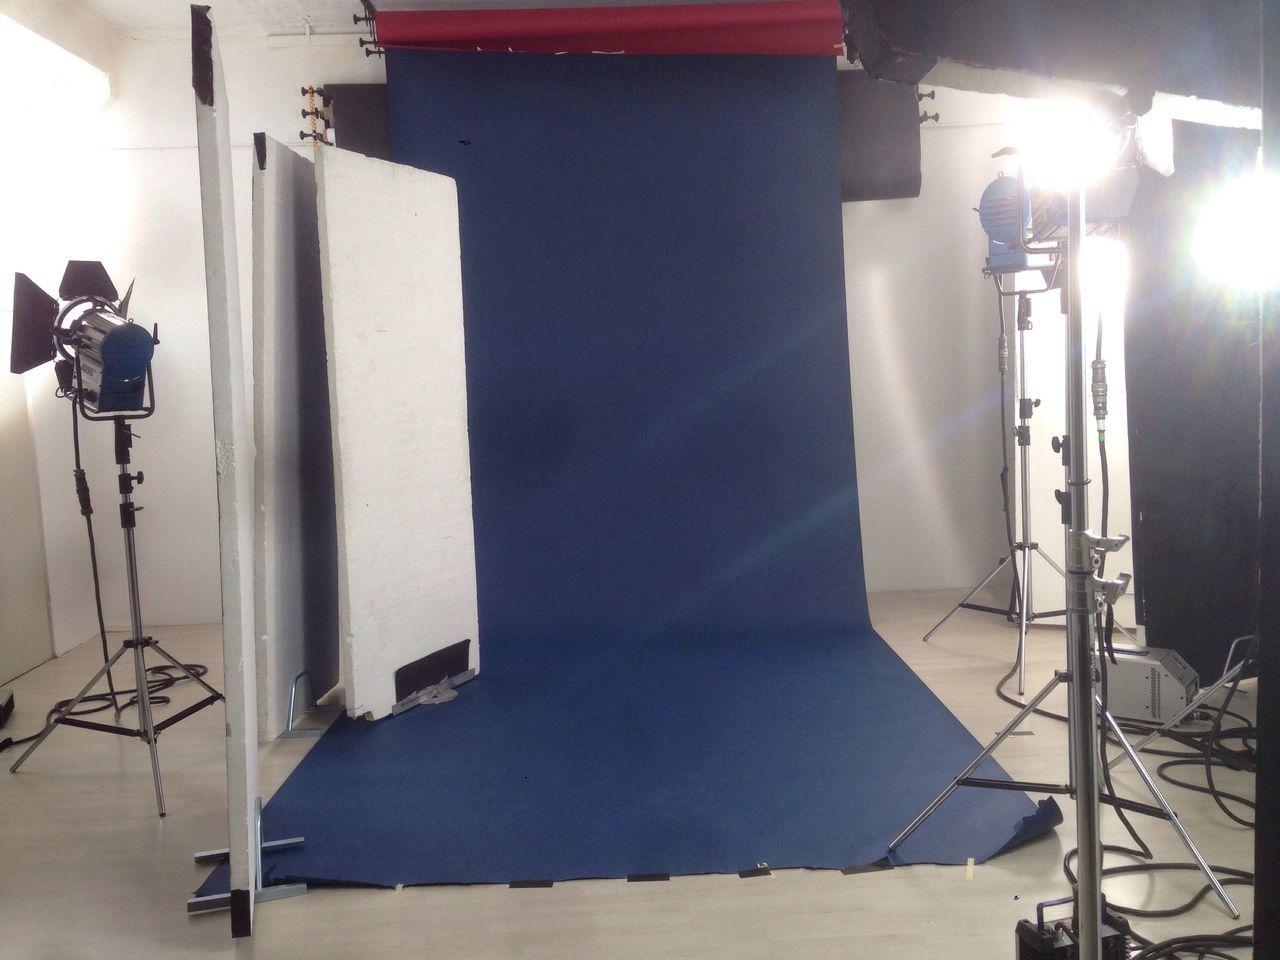 Lighting Equipment Indoors  No People Shooting Shooting Day Light Blue Studio Light And Shadow